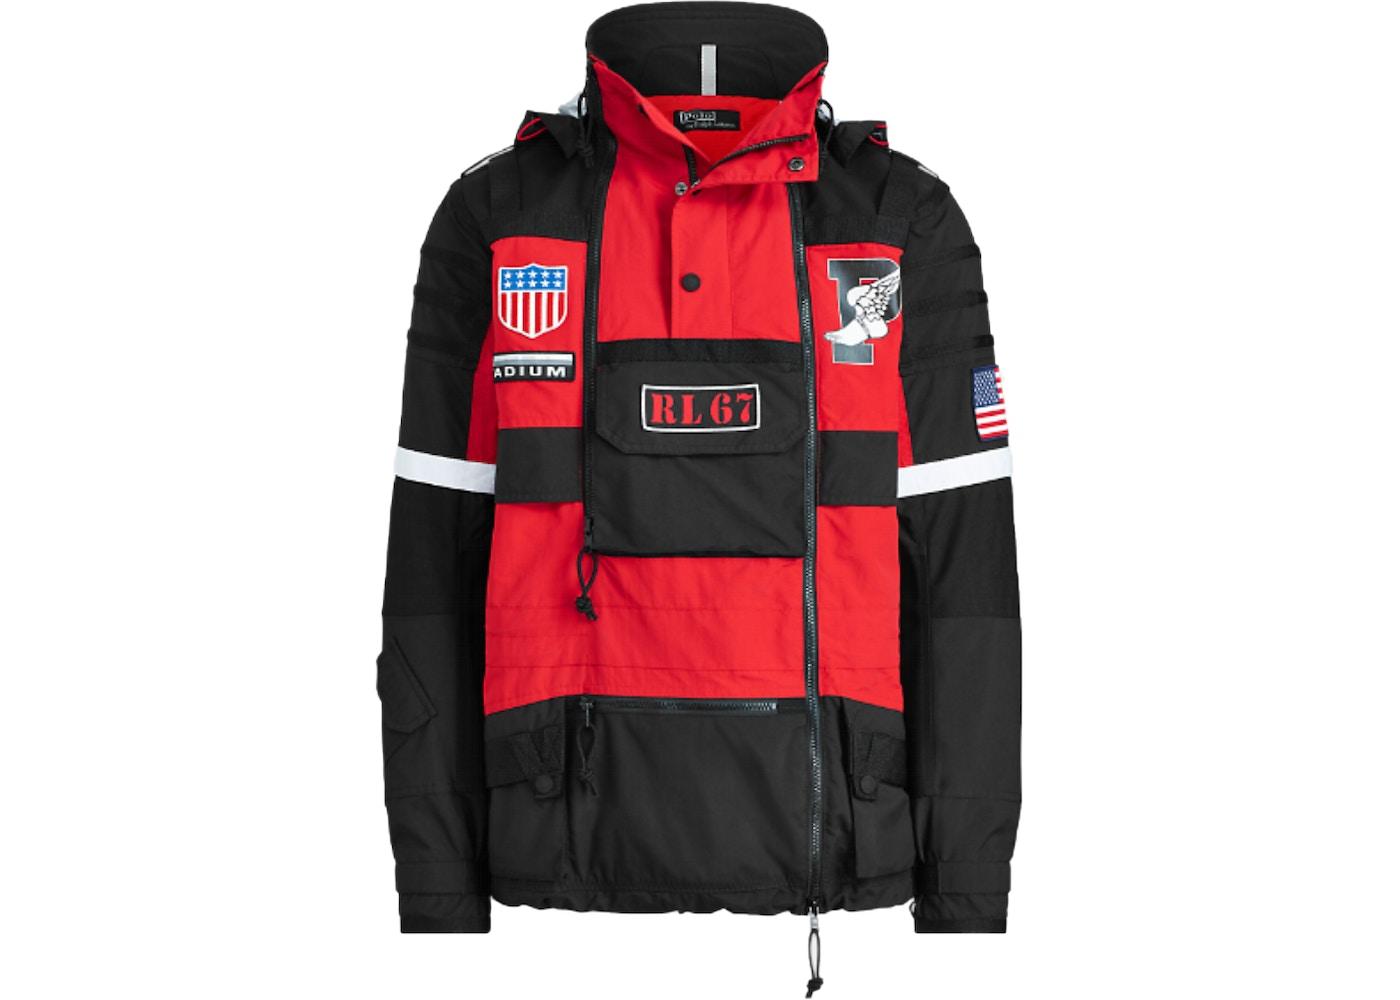 Streetwear Sell Buyamp; Other Brands Polo Nvmw8n0